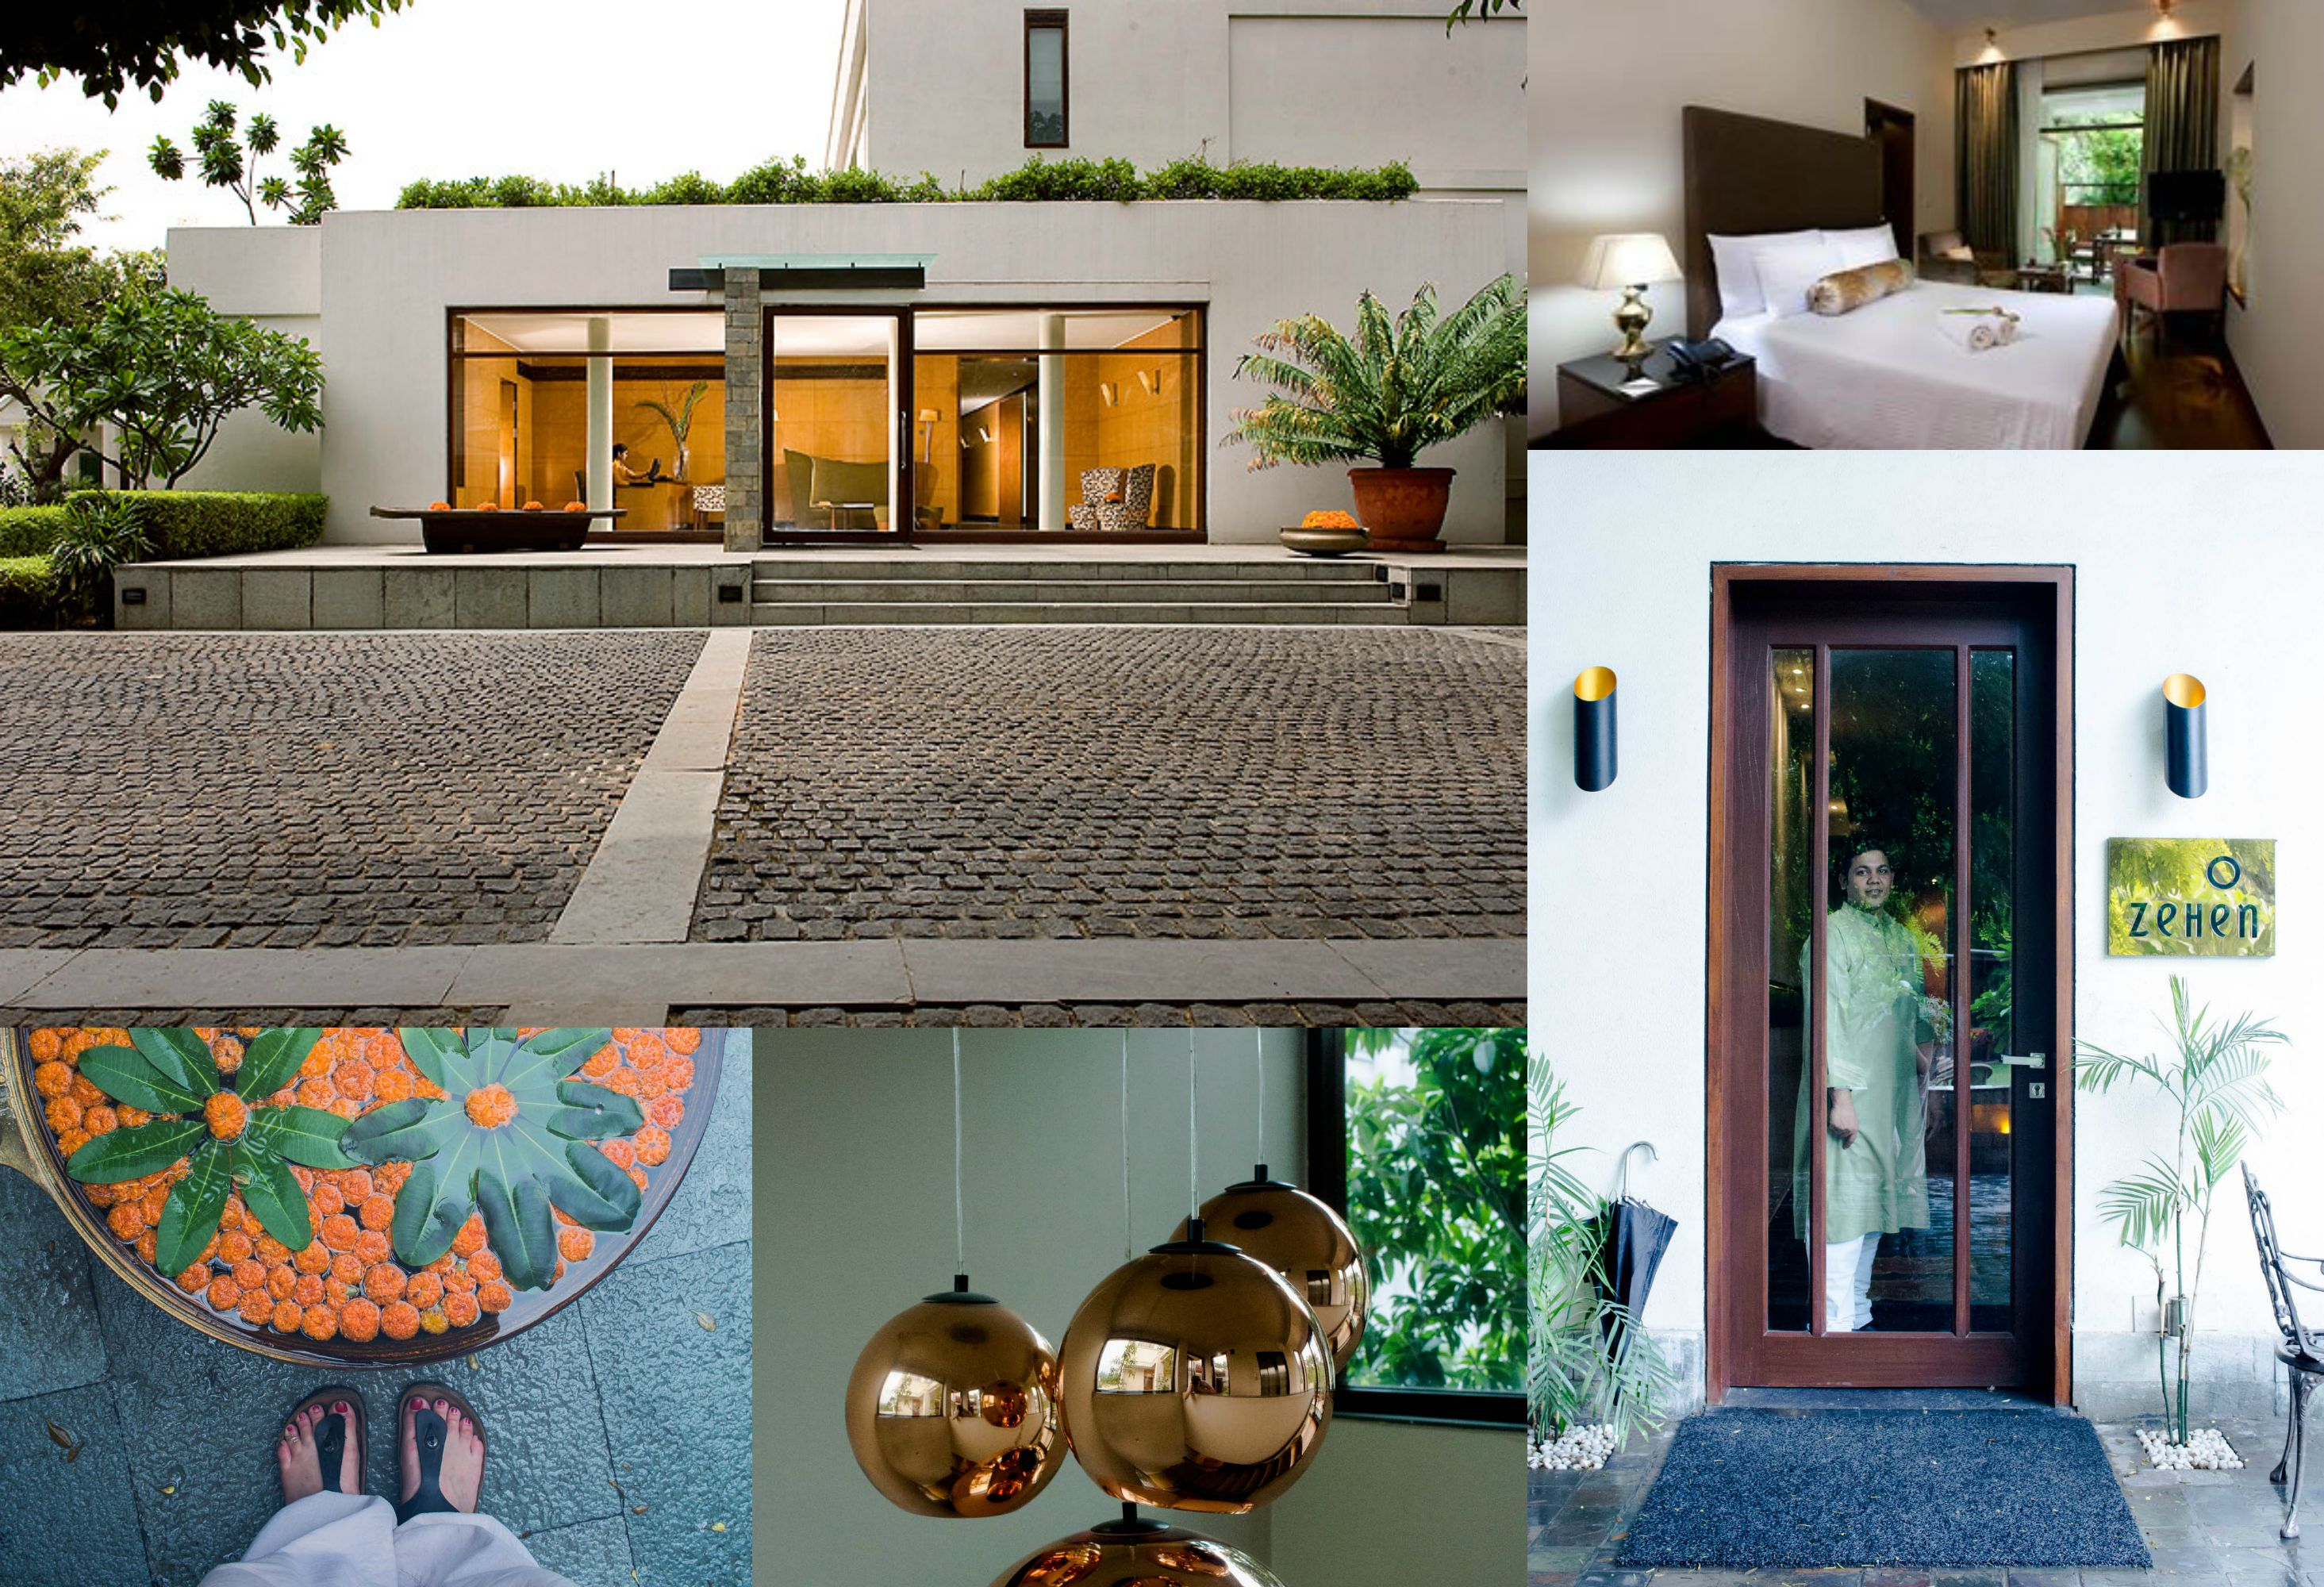 golden triangle rajasthan taj mahal jaipur delhi india tips must see kathi kamleitner travelettes-the manor